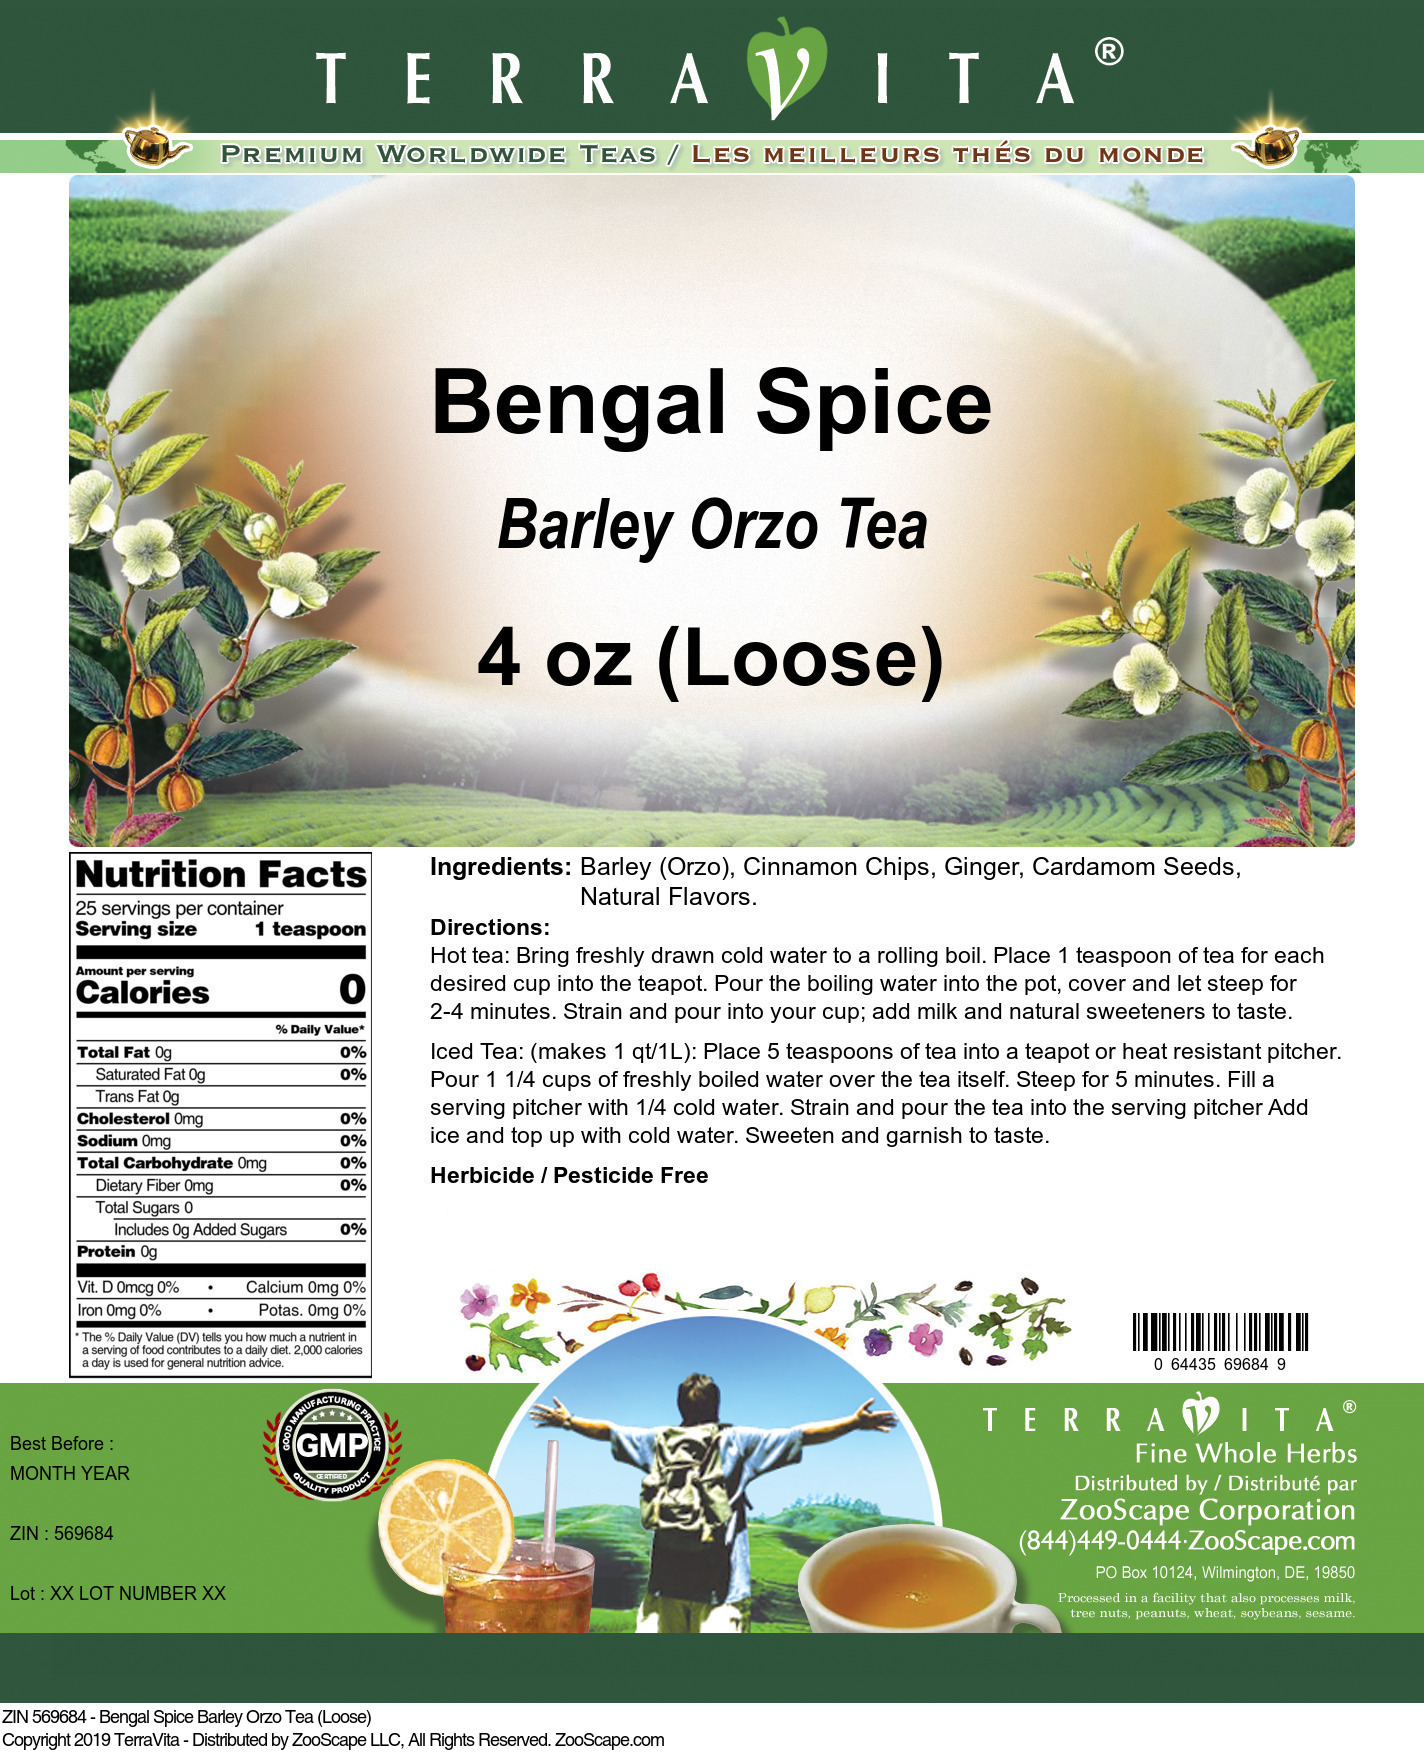 Bengal Spice Barley Orzo Tea (Loose)